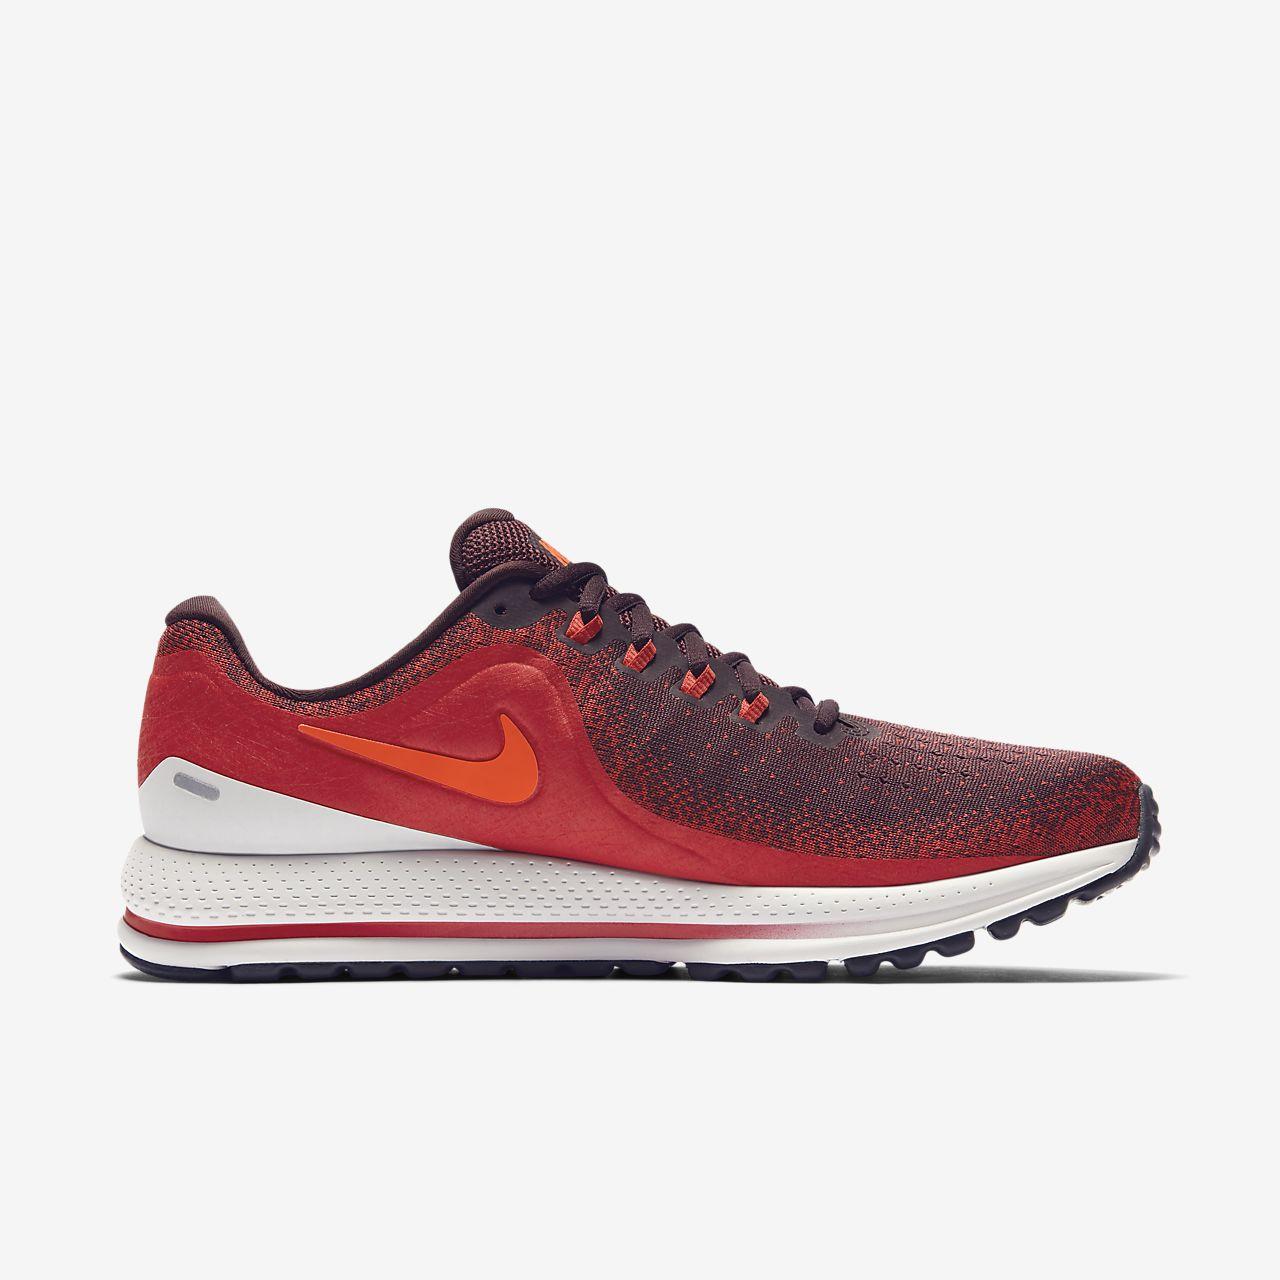 new concept d4211 a48e3 Nike Homme Jordan 1 Flight 4 Basketball Chaussures - Bordeaux 600, 42.5